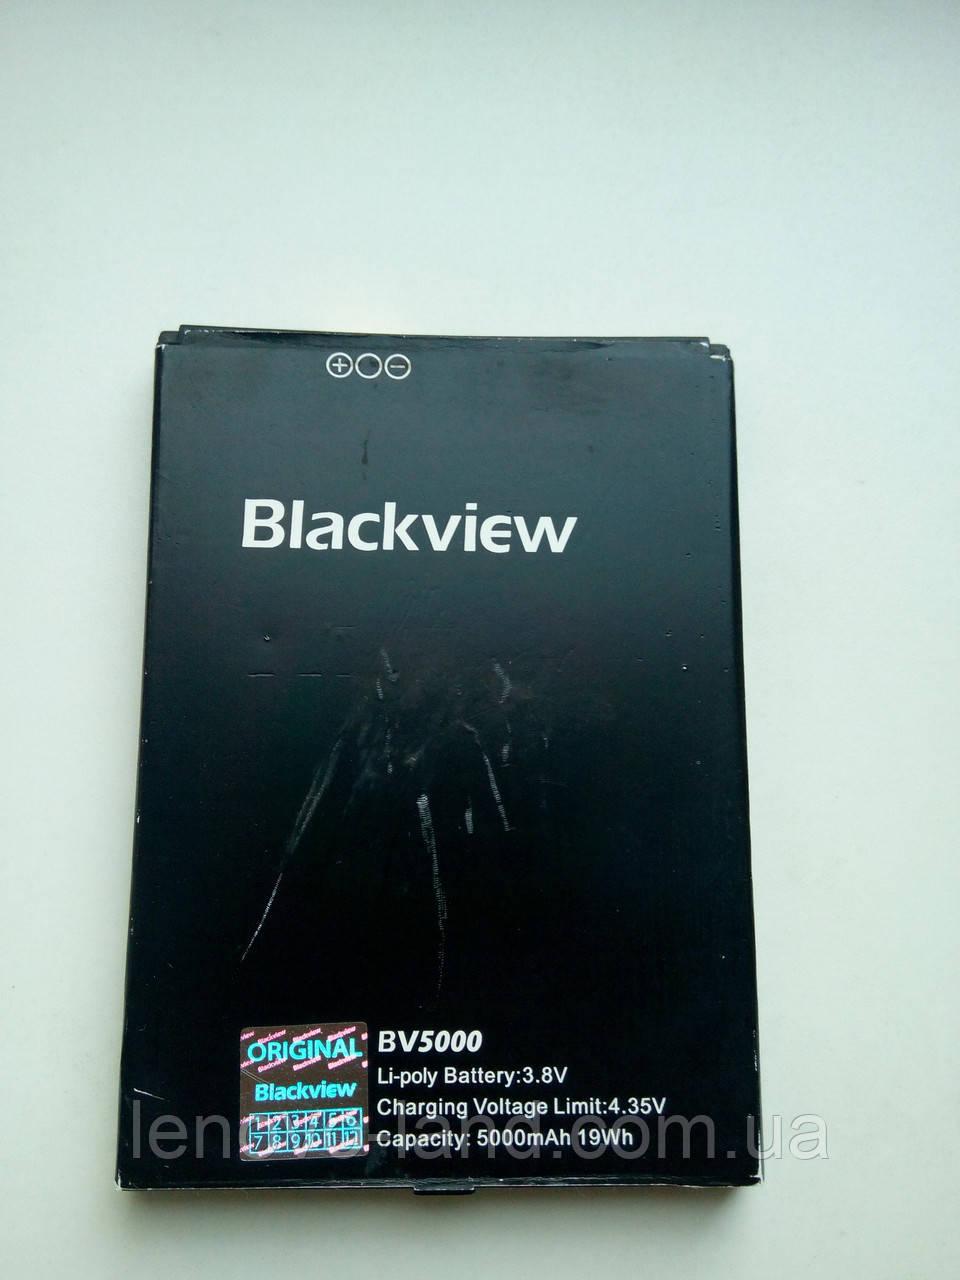 Аккумулятор АКБ для Blackview BV5000 батарея запчасти